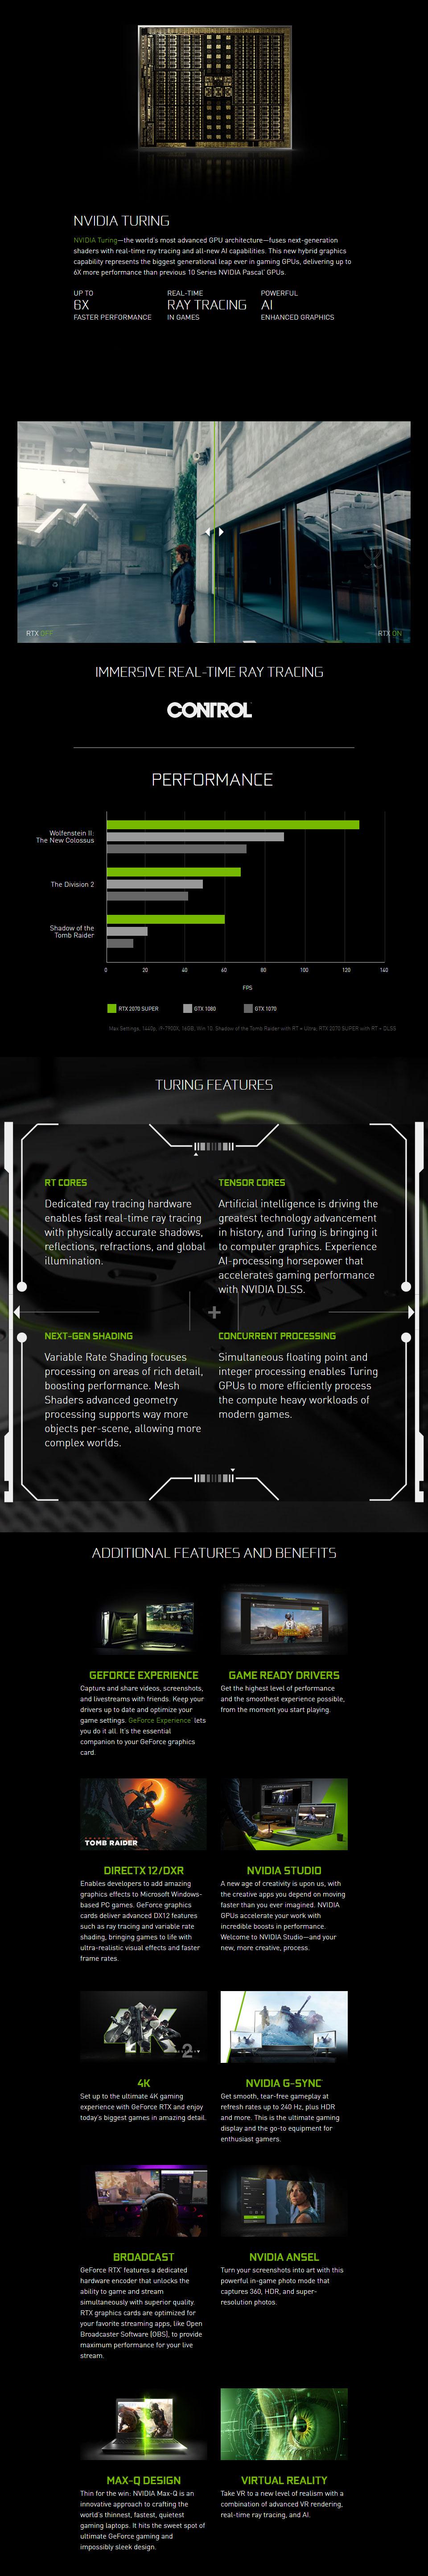 MSI GeForce RTX 2070 Super Gaming X Trio 8GB